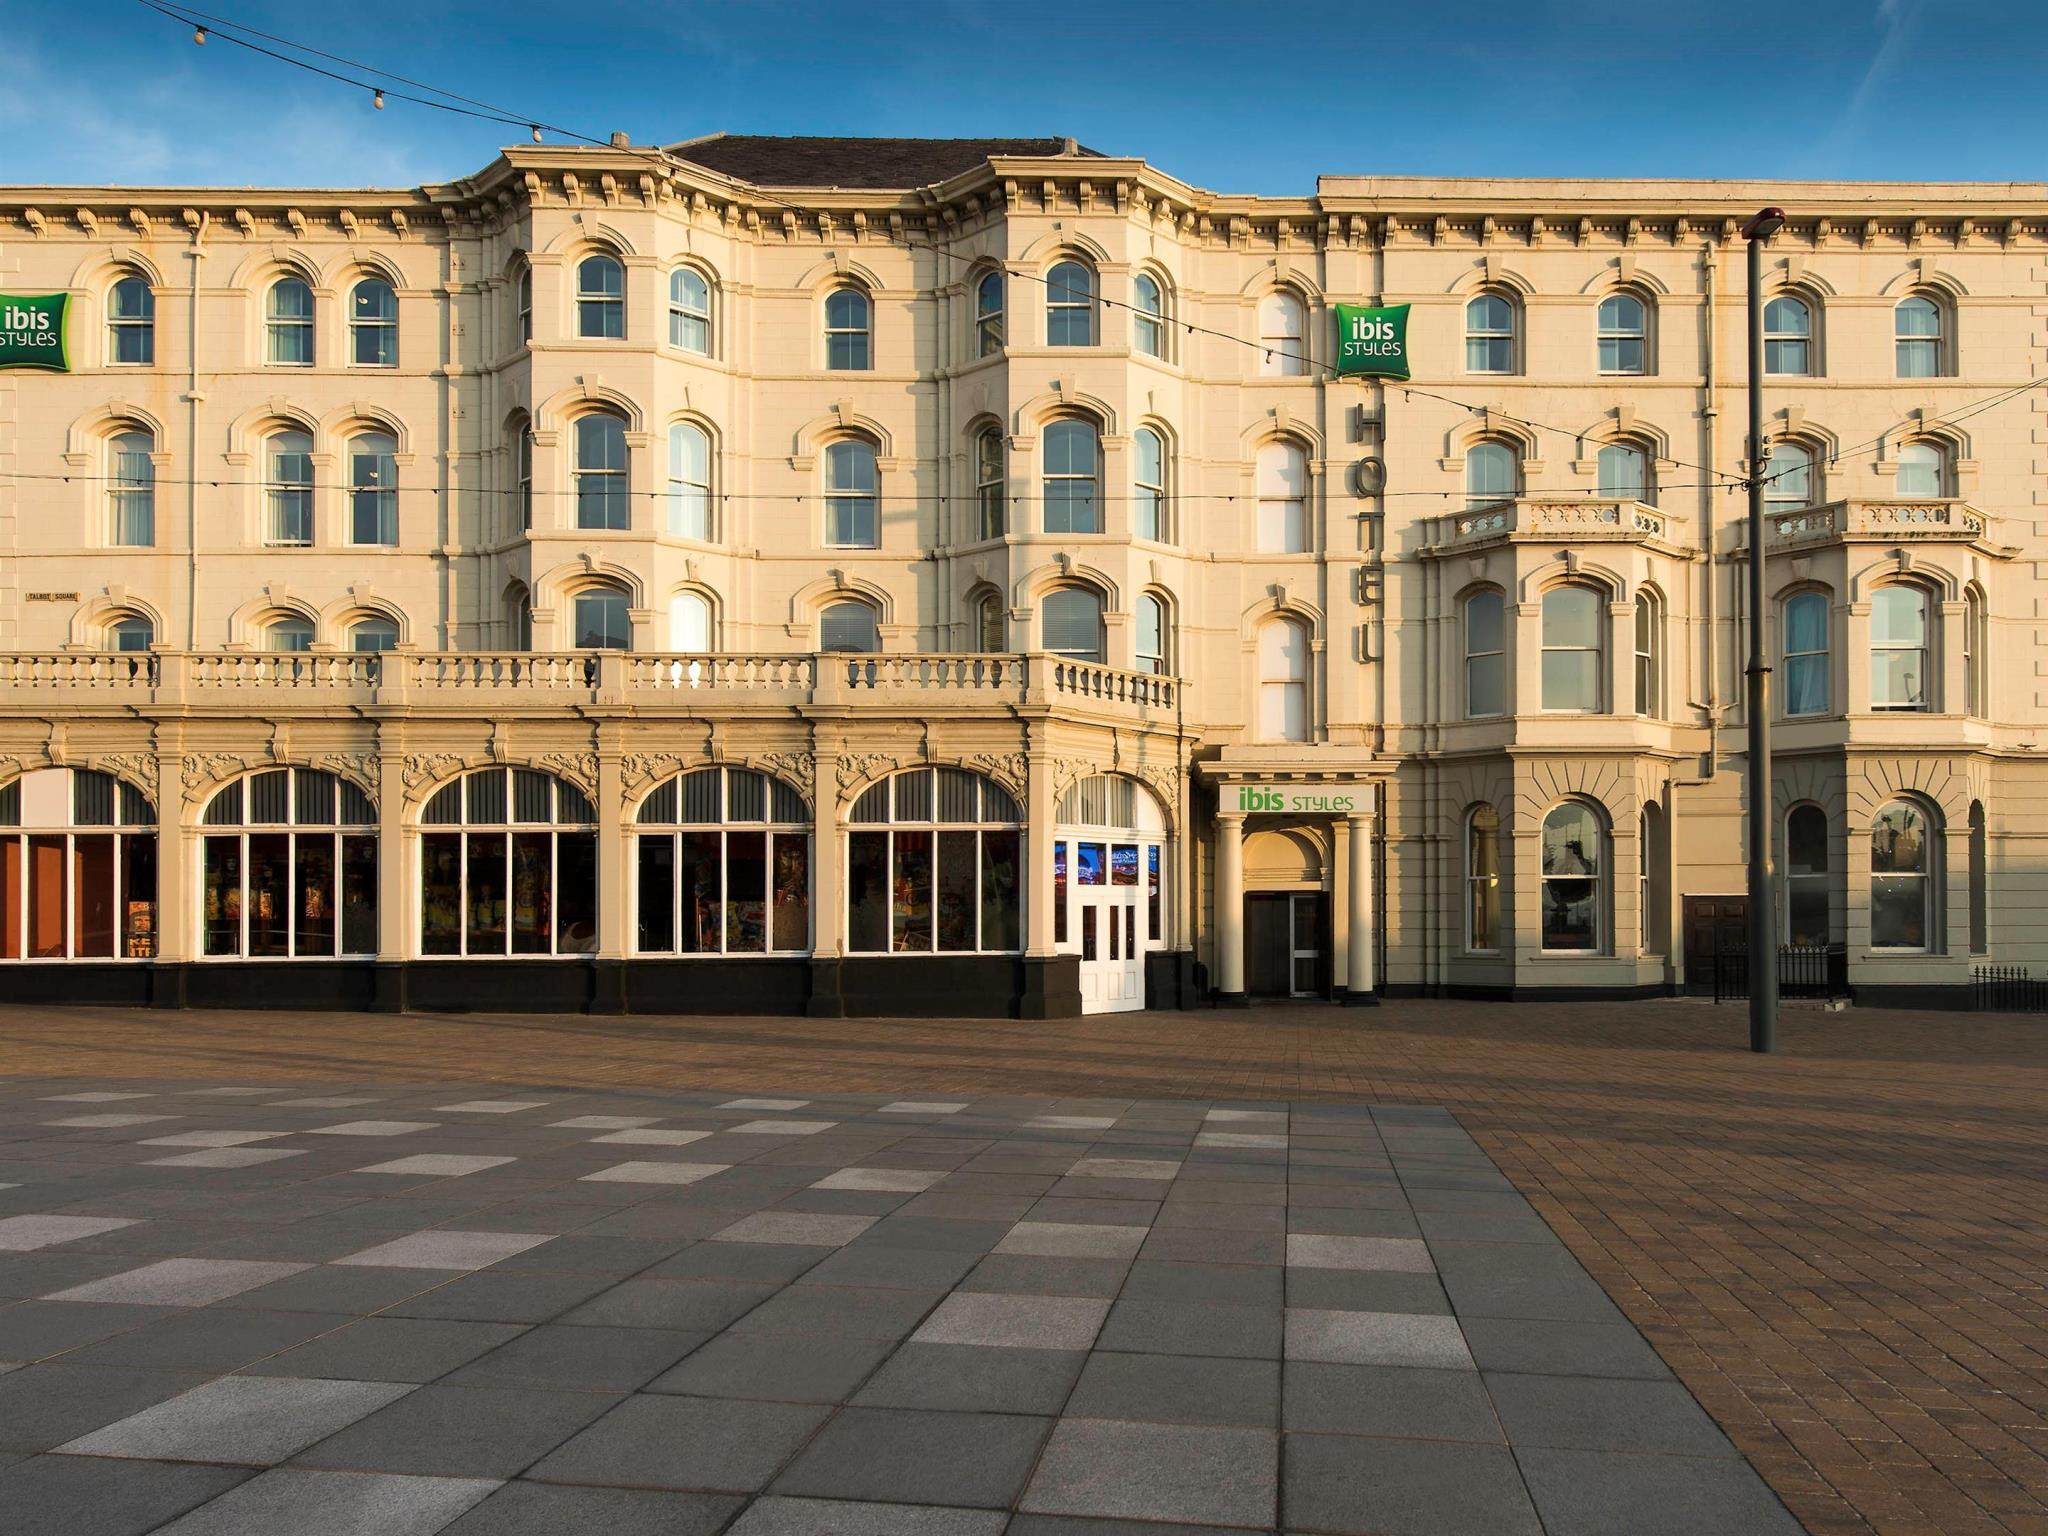 Ibis Styles Blackpool Hotel